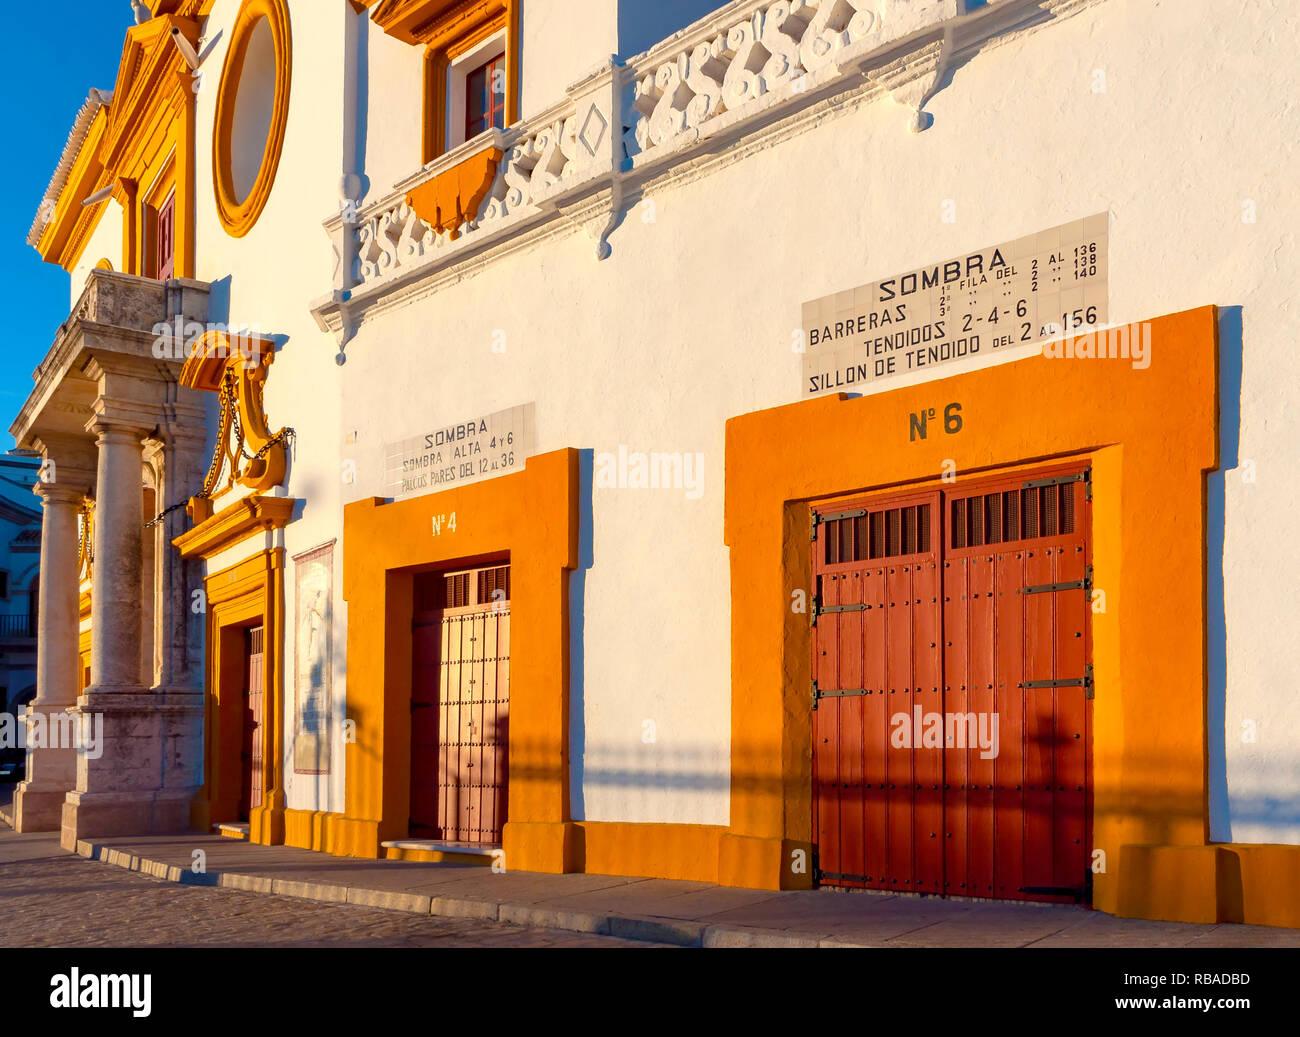 Detail the colorful Baroque facade of Plaza de Toros de la Maestranza, the famous bullring of Seville - Stock Image